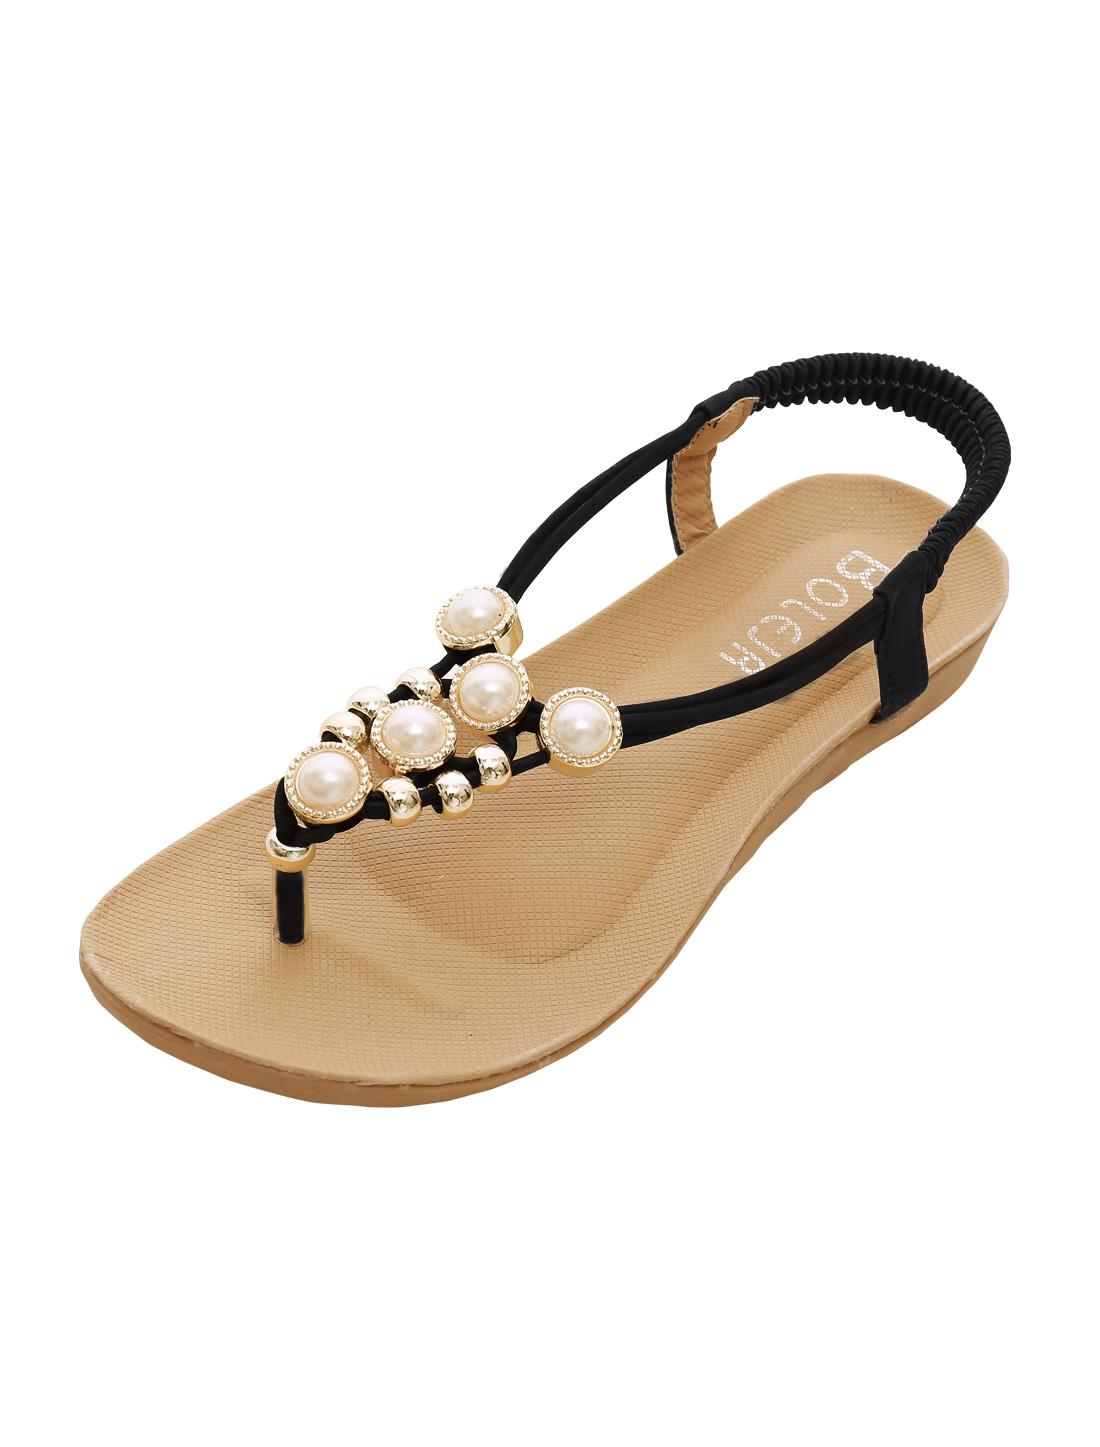 Woman Rhinestones Embellished Summer Casual Flat Sandals Black US 6